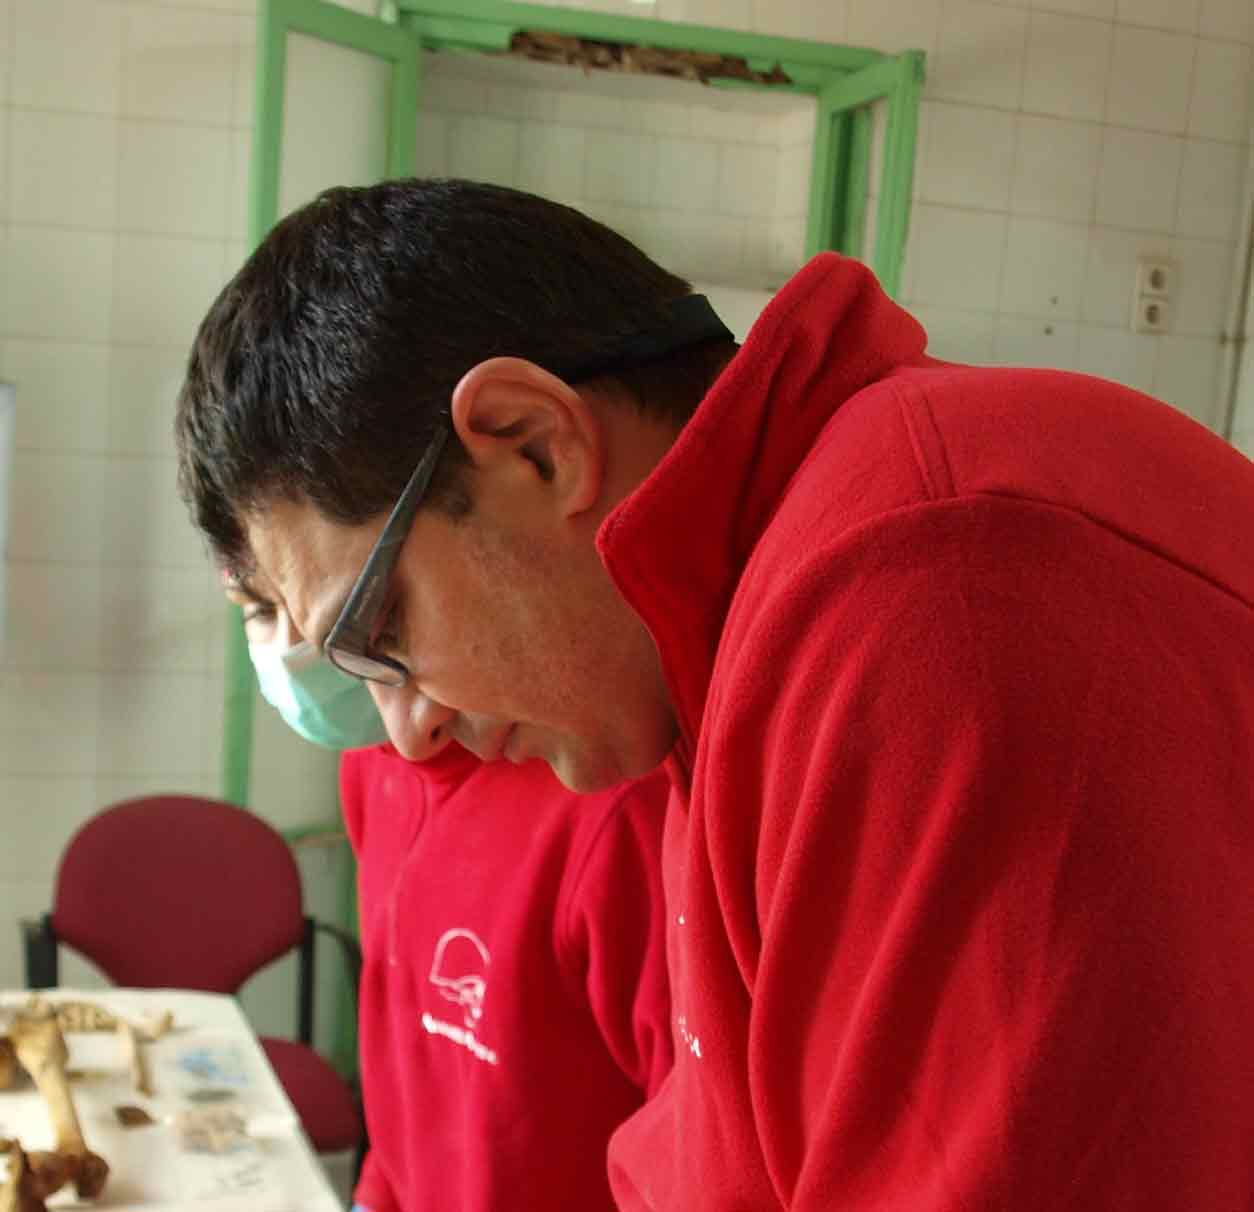 Enrique Olivares Pardo